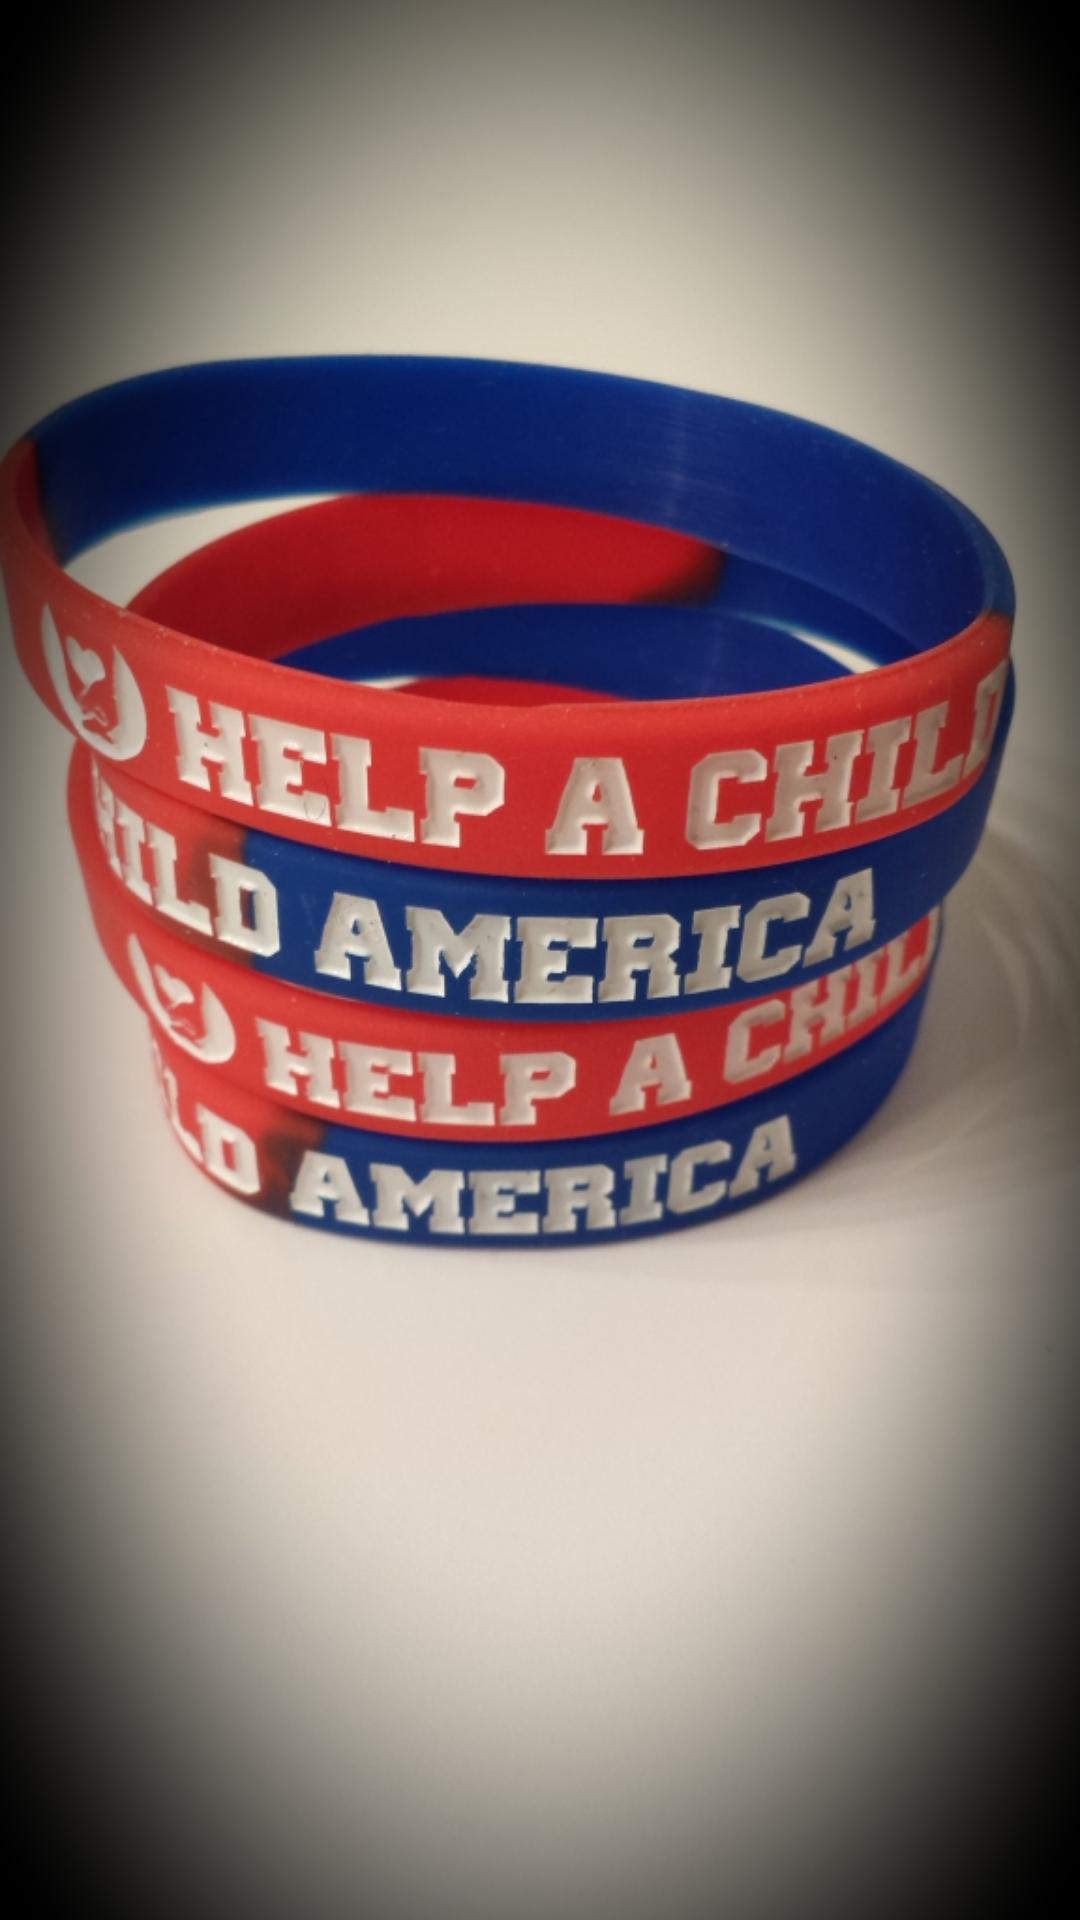 """HELP A CHILD AMERICA"""